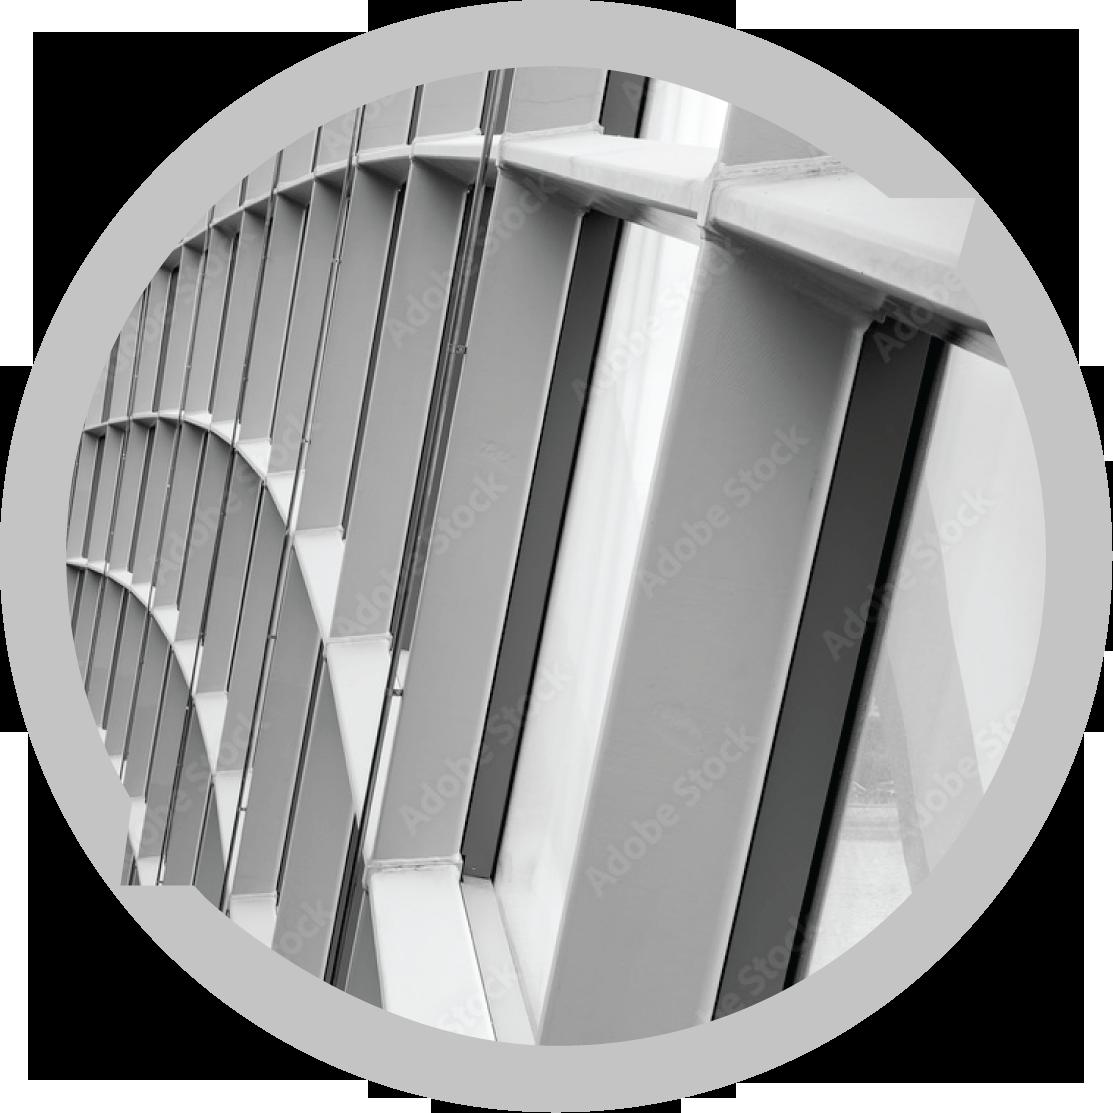 Sonderkonstruktionen Hoffmann GmbH Thyrnau Passau - Spenglerei Heizung Lüftung Sanitär Foliendäche